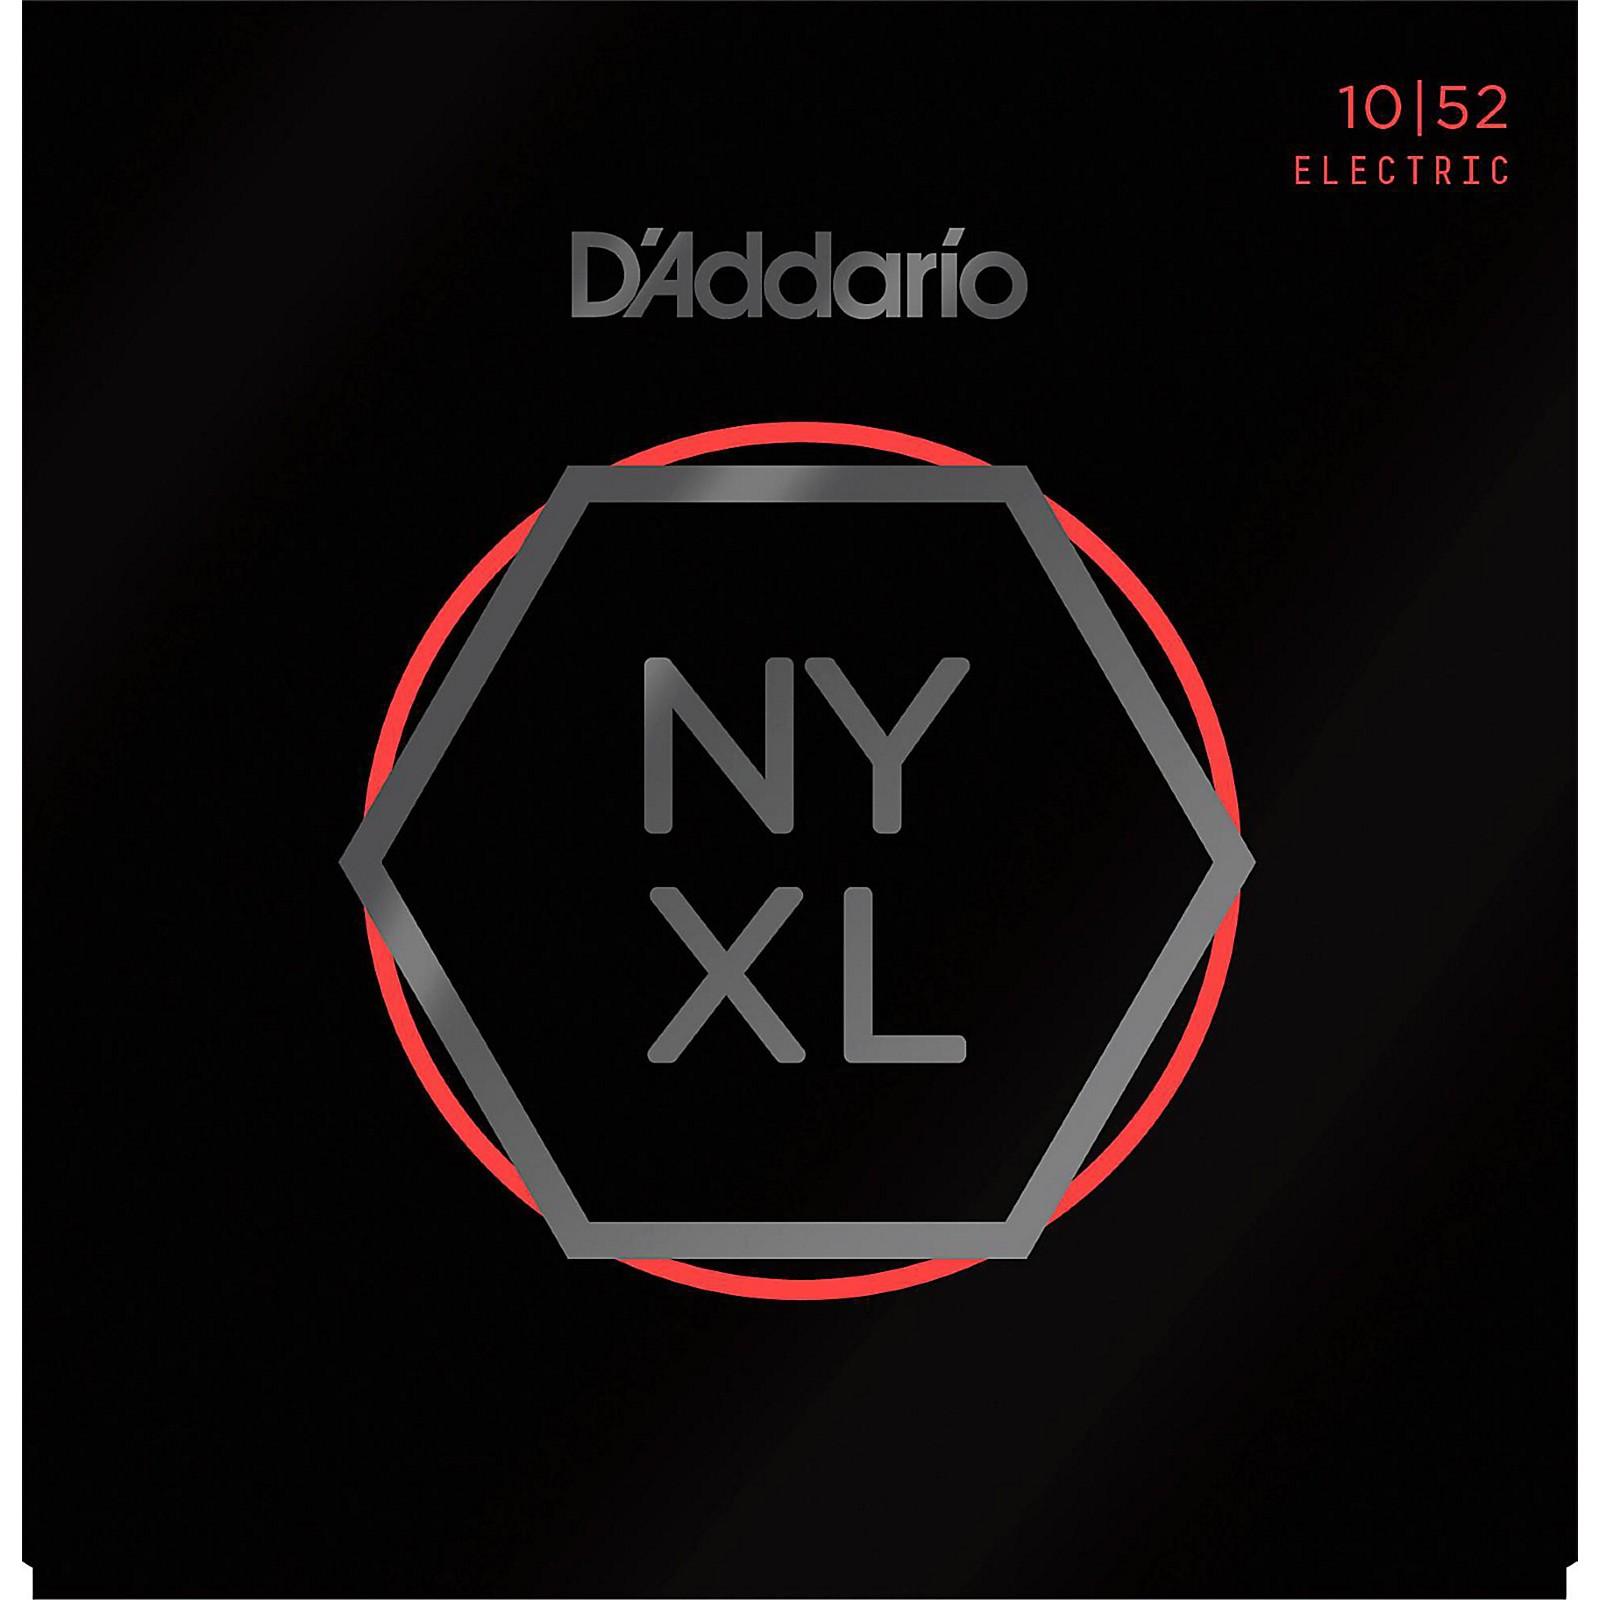 D'Addario NYXL1052 Light Top/Heavy Bottom Electric Guitar Strings